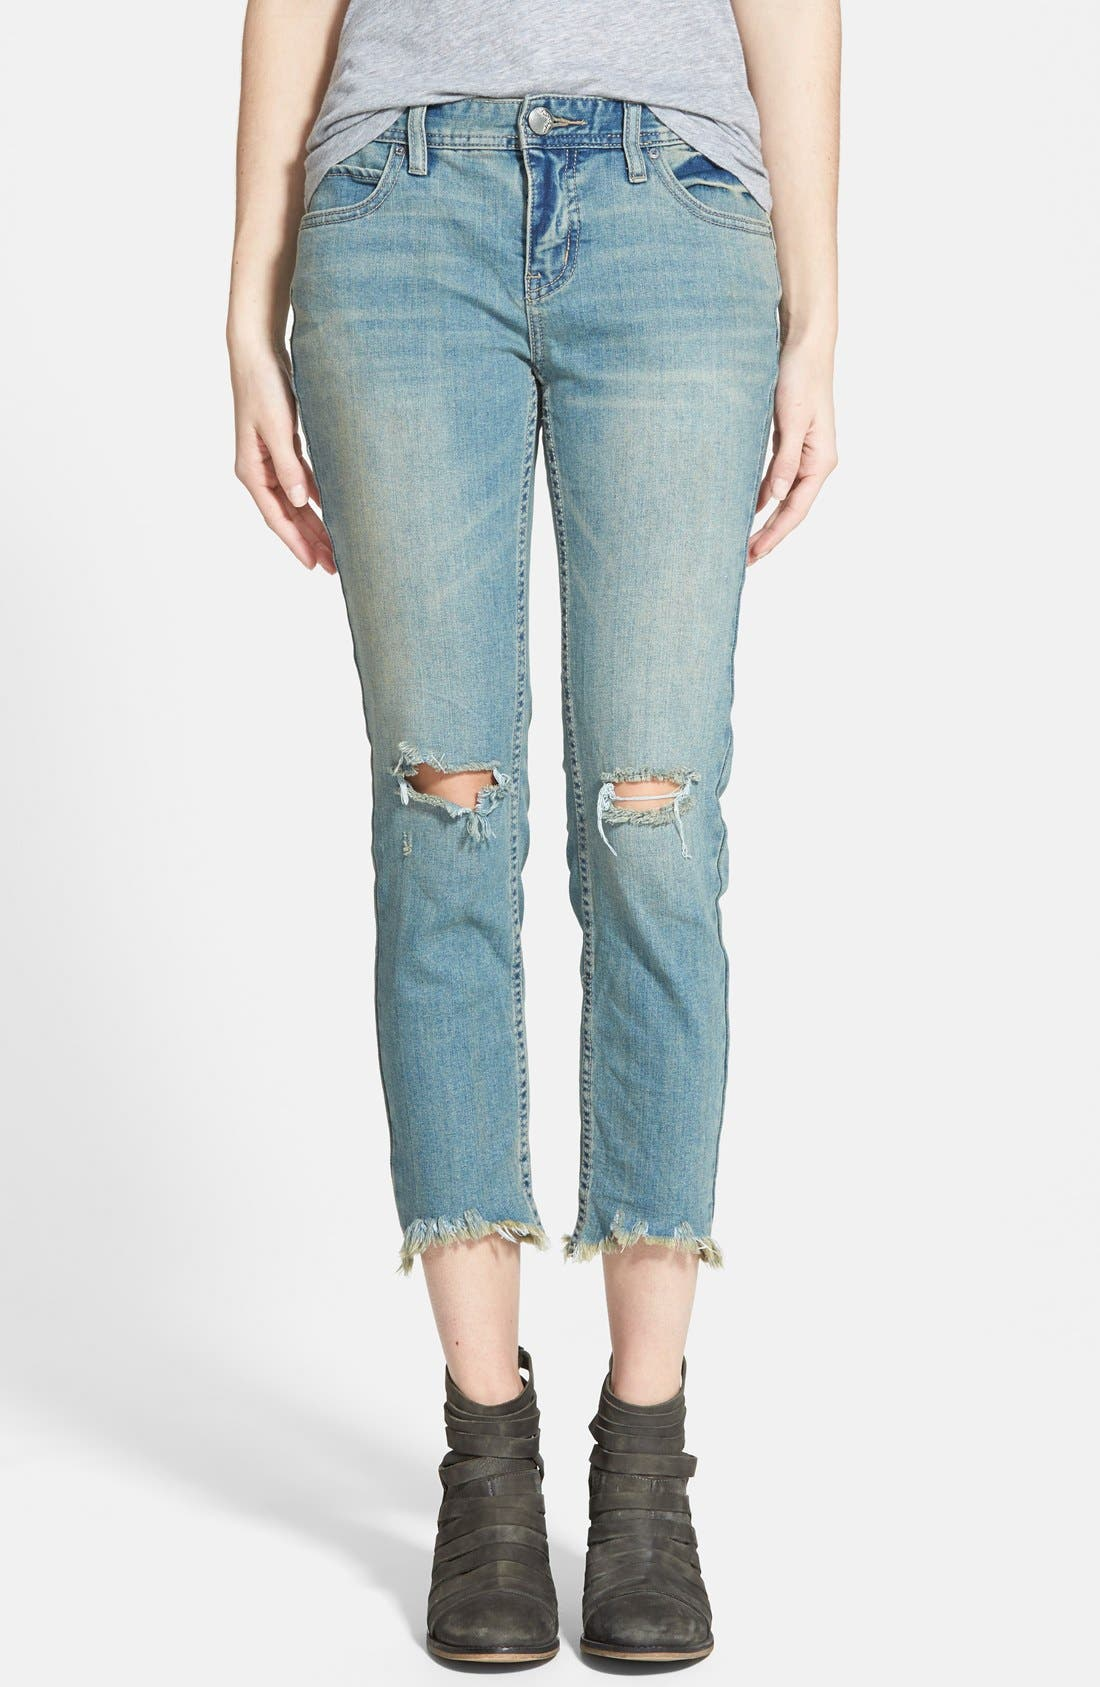 Alternate Image 1 Selected - Free People Destroyed Skinny Jeans (Sitka)